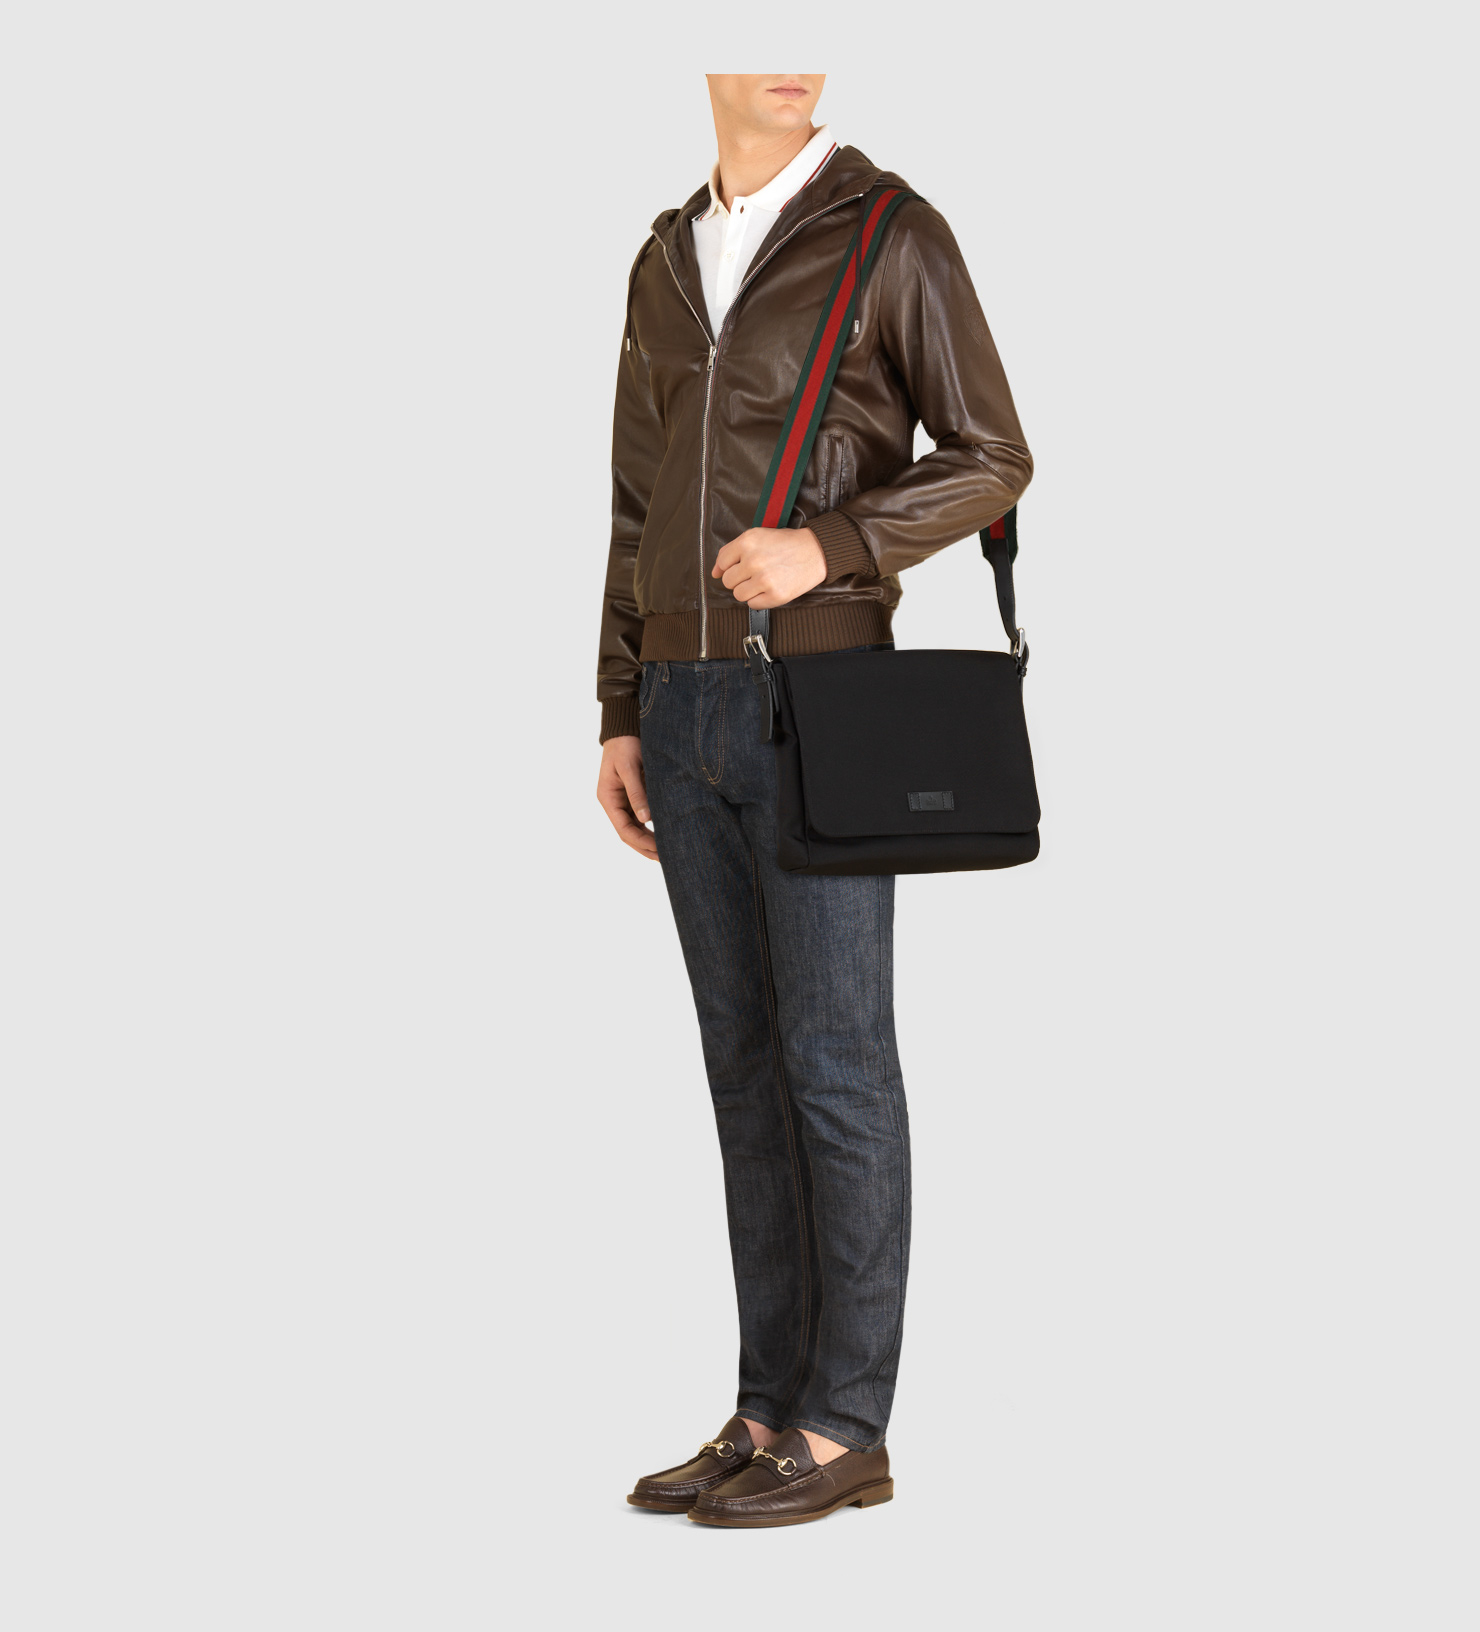 aa0a27ebbeb Lyst - Gucci Black Techno Canvas Messenger Bag in Black for Men